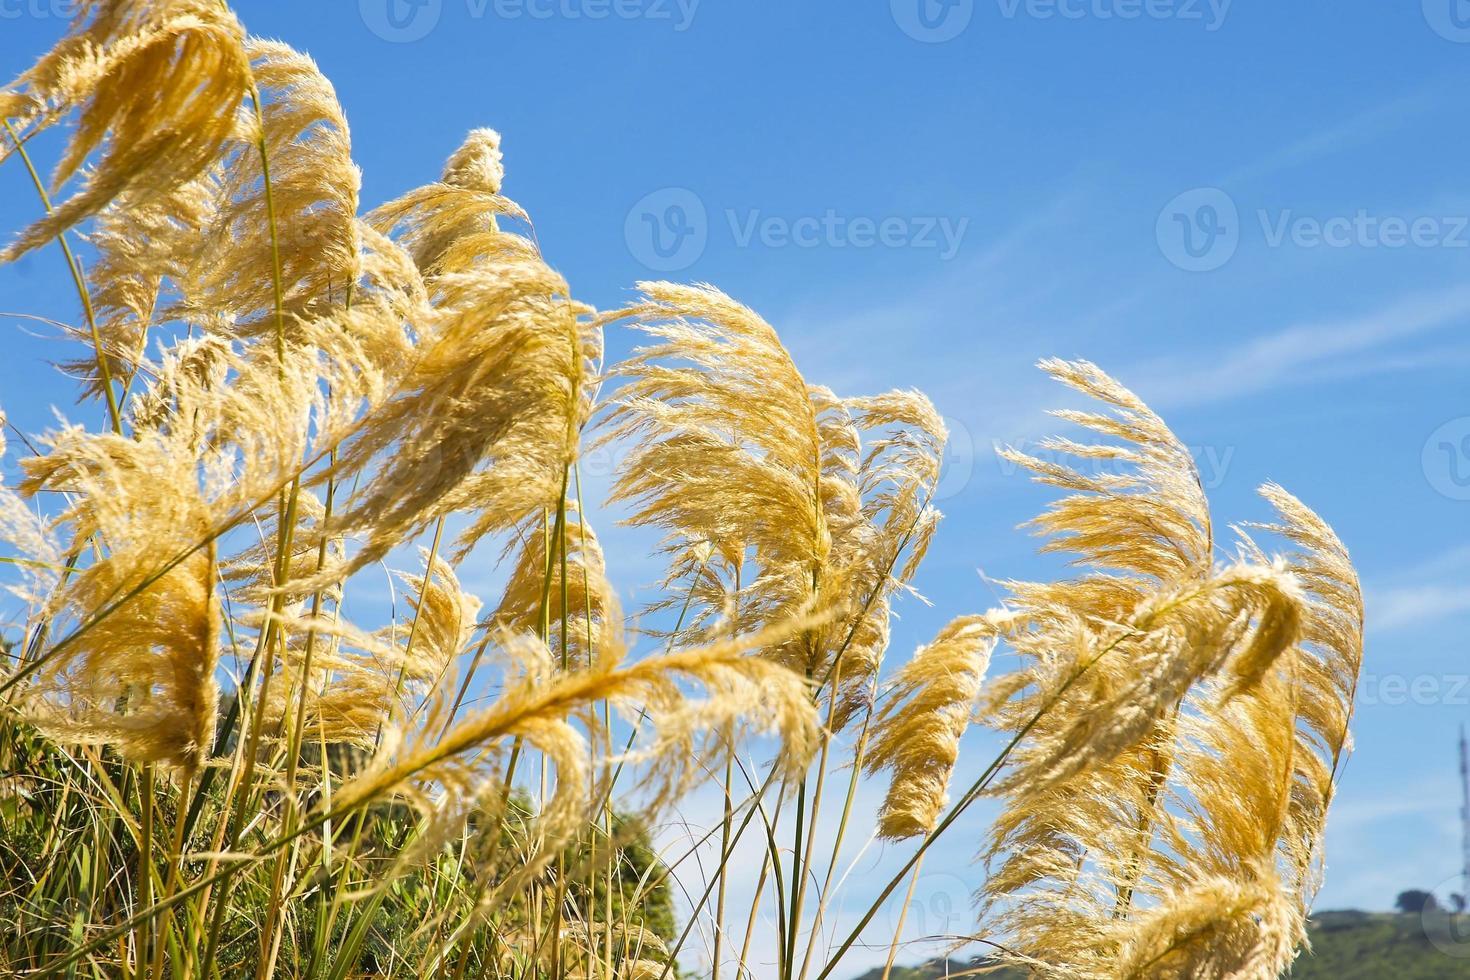 L'herbe de la pampa dans le vent contre un ciel bleu photo